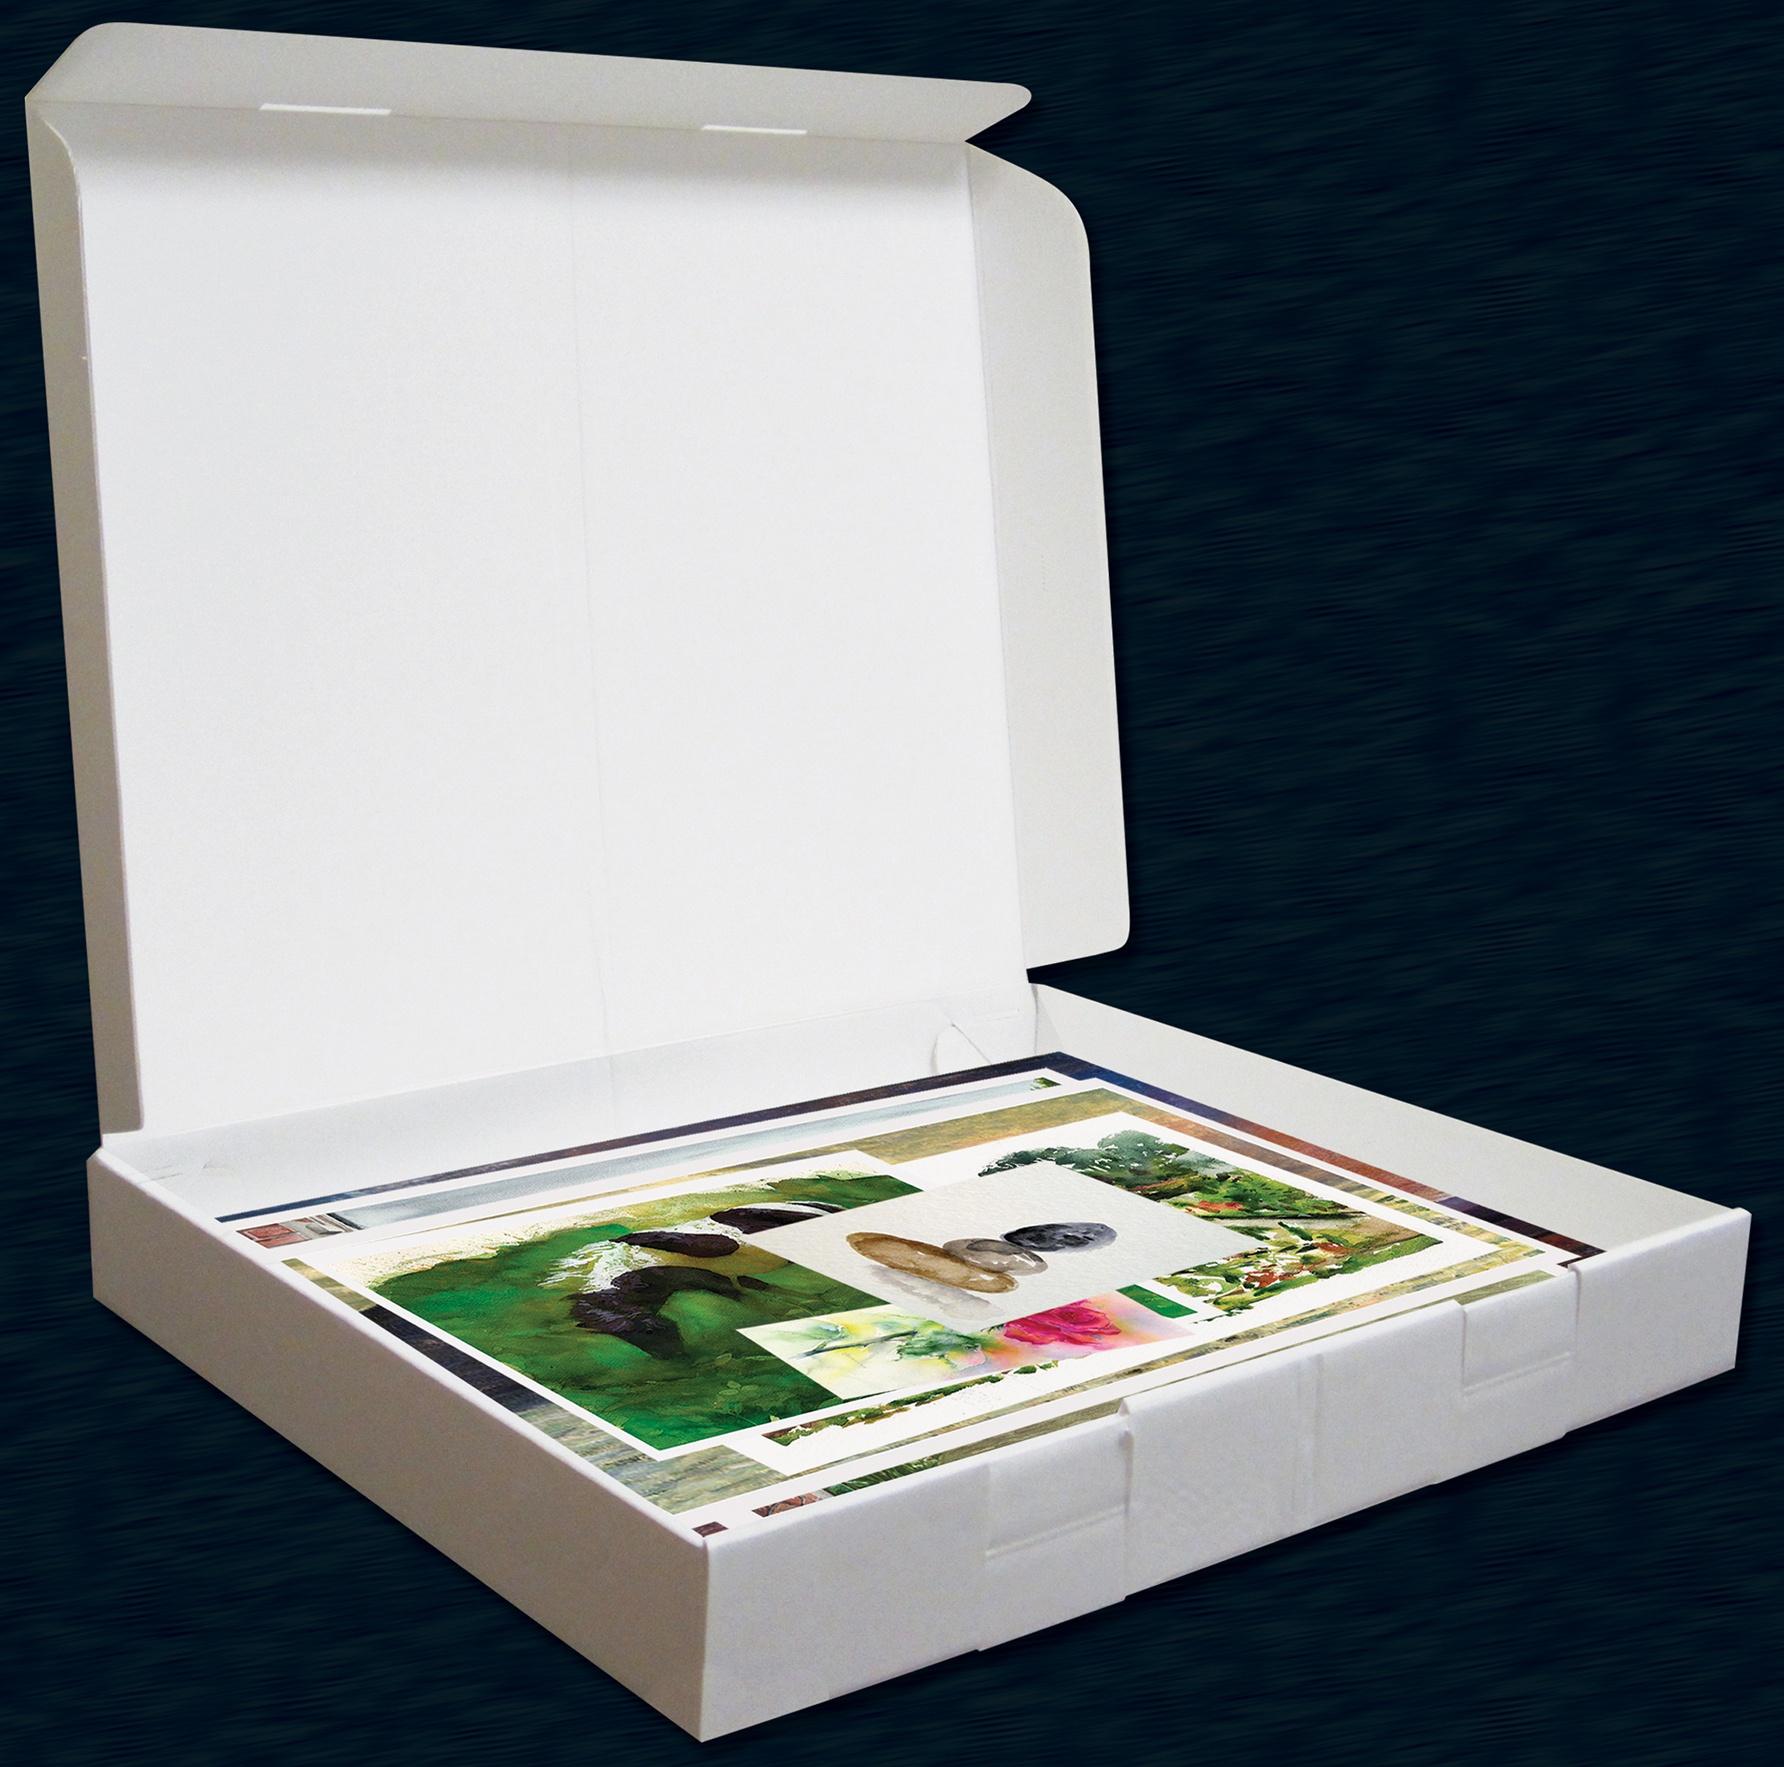 PROP-IT Storage Box 16x20x1.5 -Large